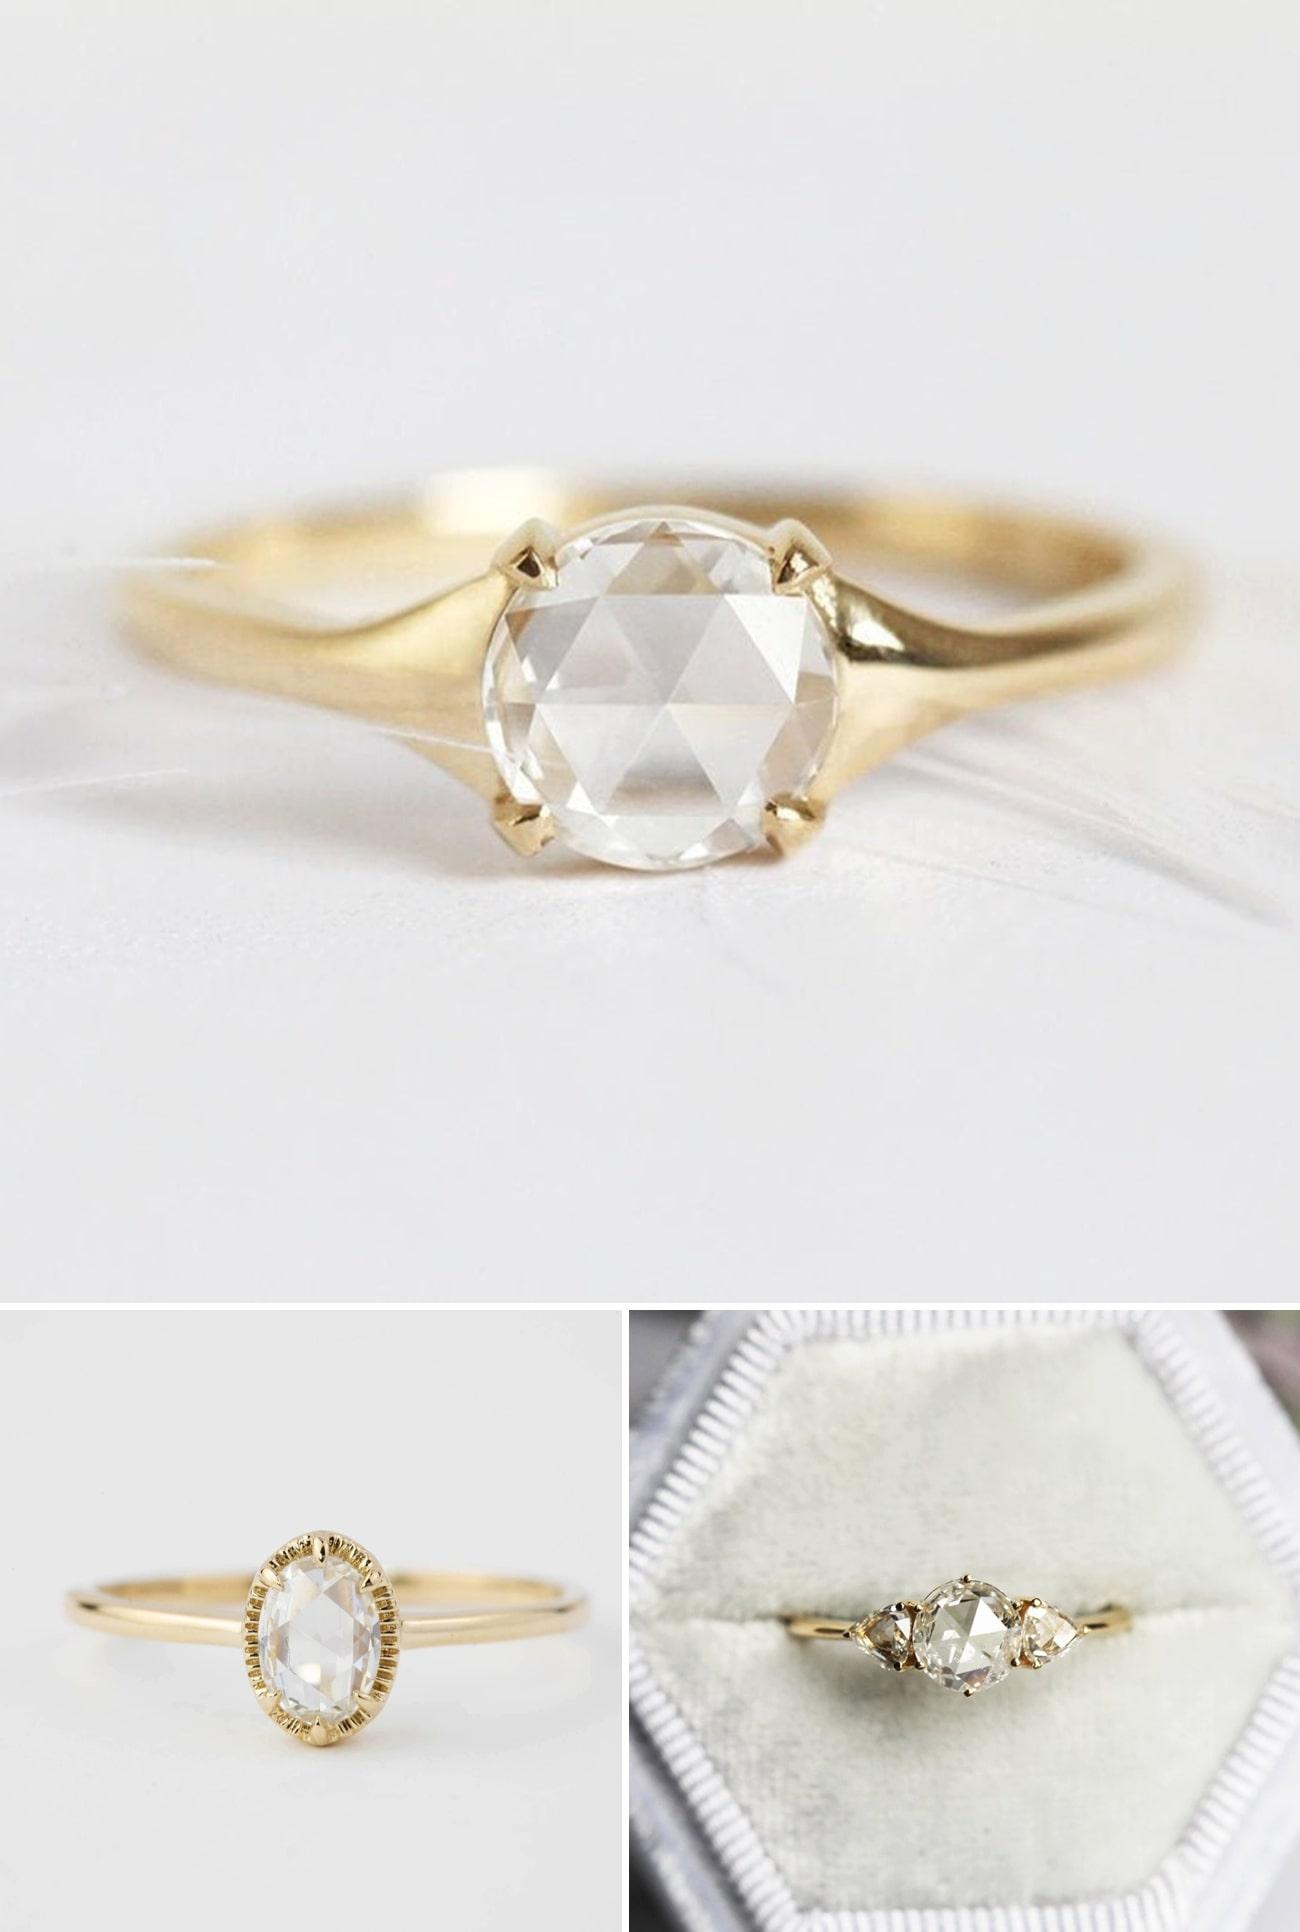 2021 Engagement Ring Trends Rose Cut Diamond Engagement Rings